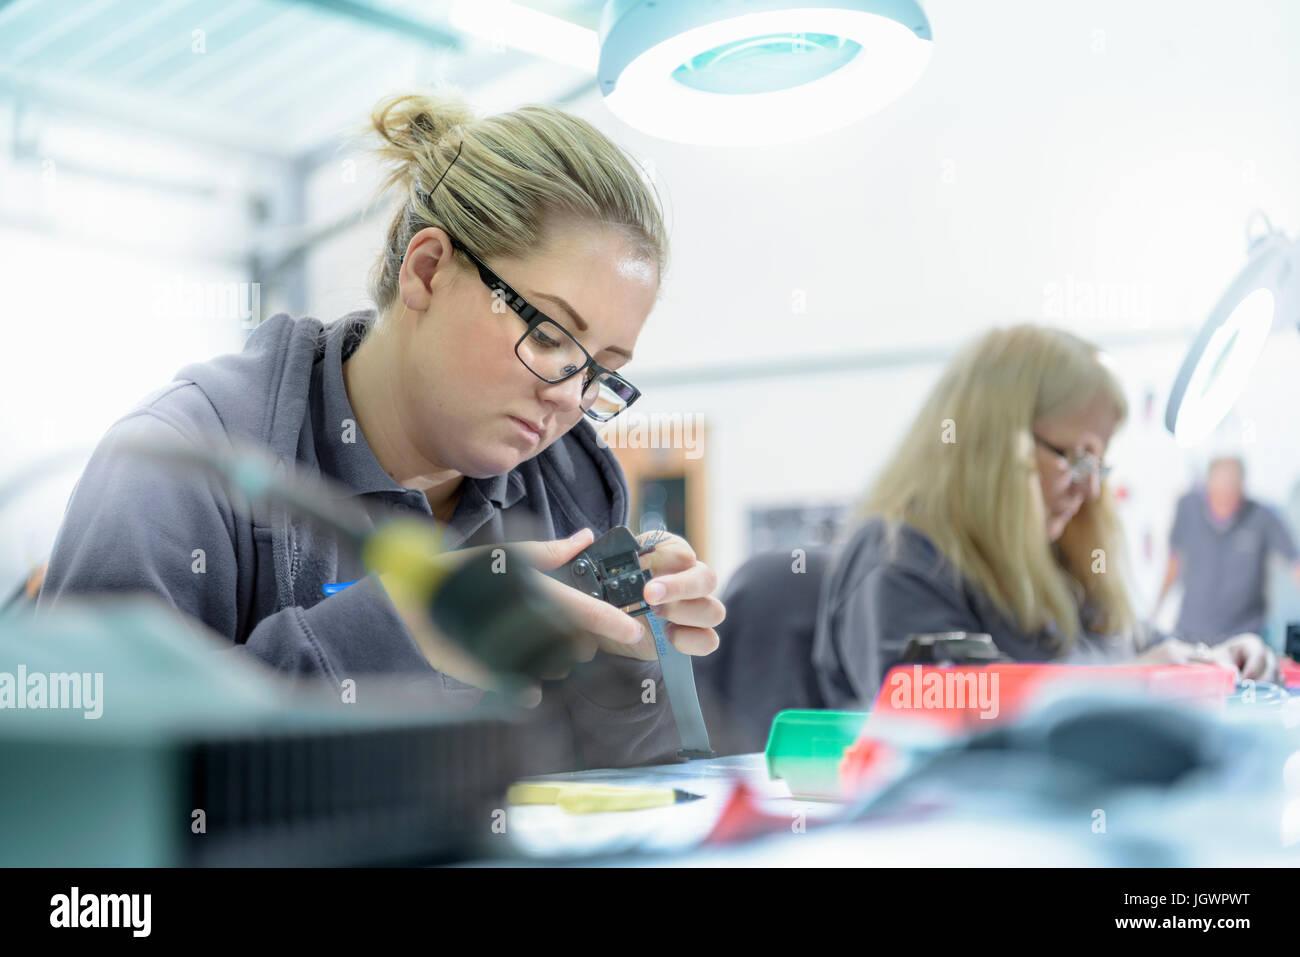 Weiblichen Lehrling Elektroingenieure Kabel Abschluss Fabrik Stockfoto